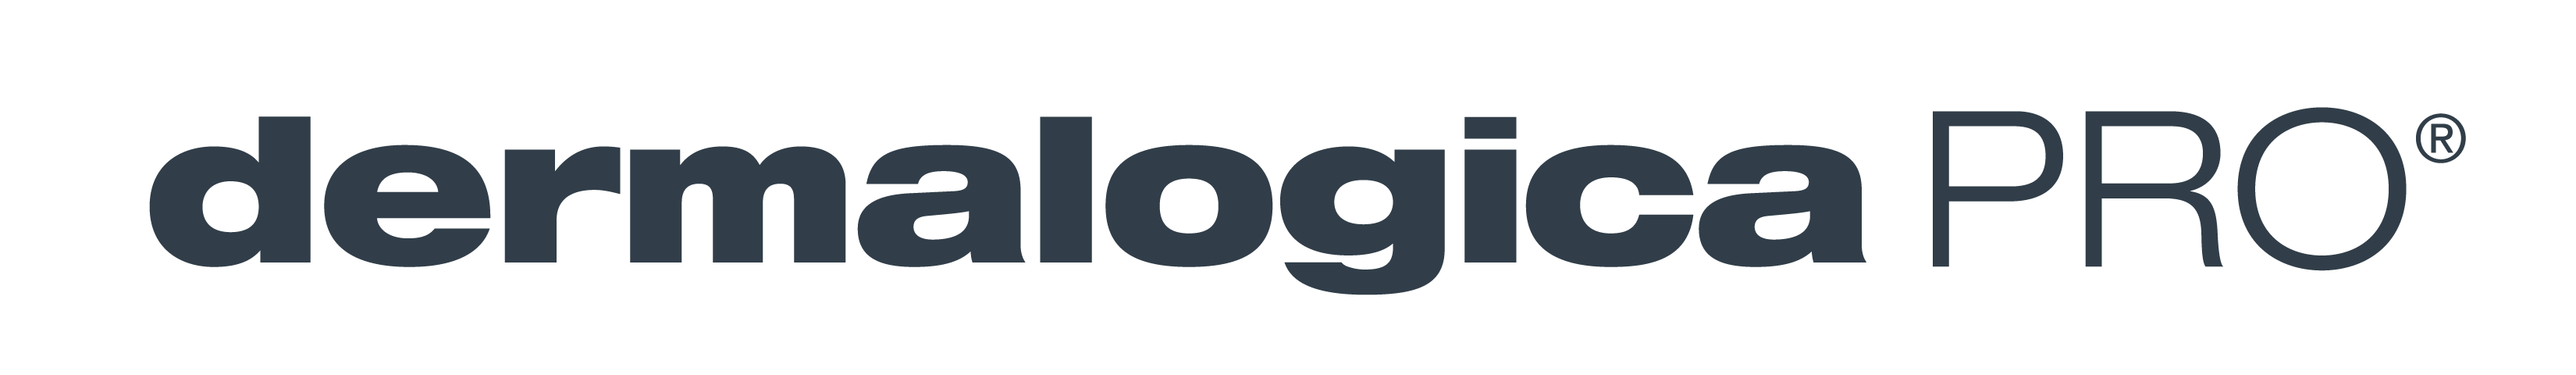 Dermalogica_Pro_Logo_PMS432